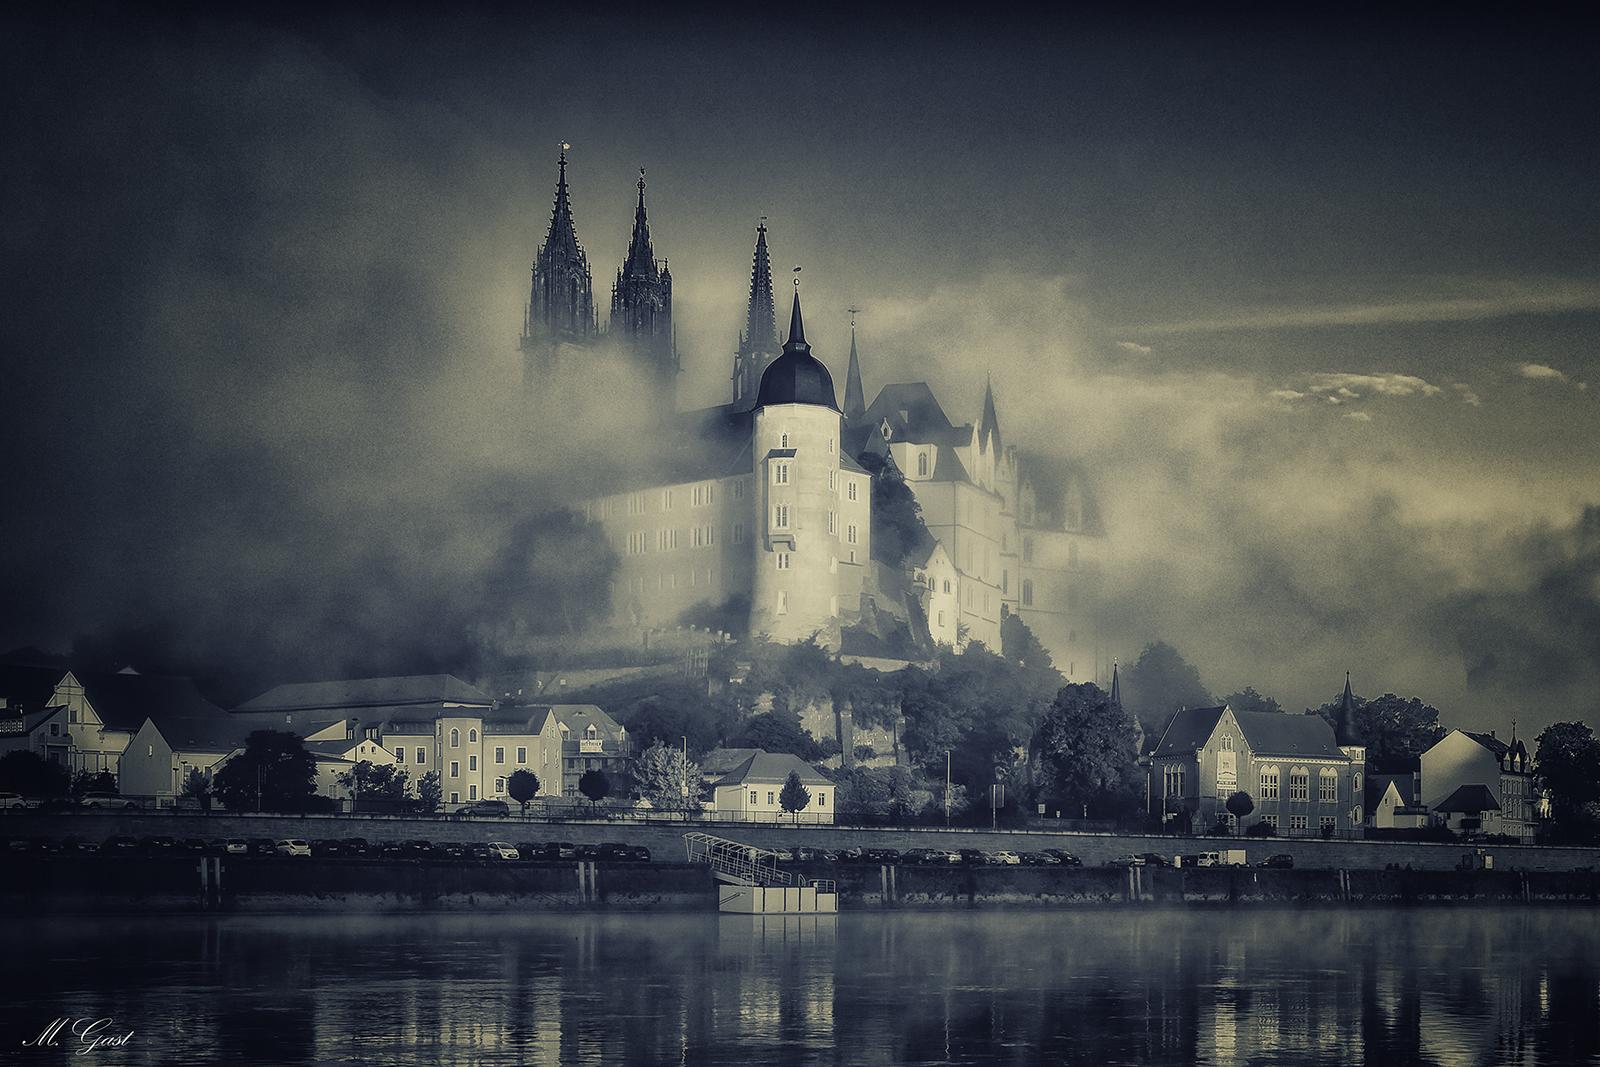 seltsam ist im nebel zu wandern